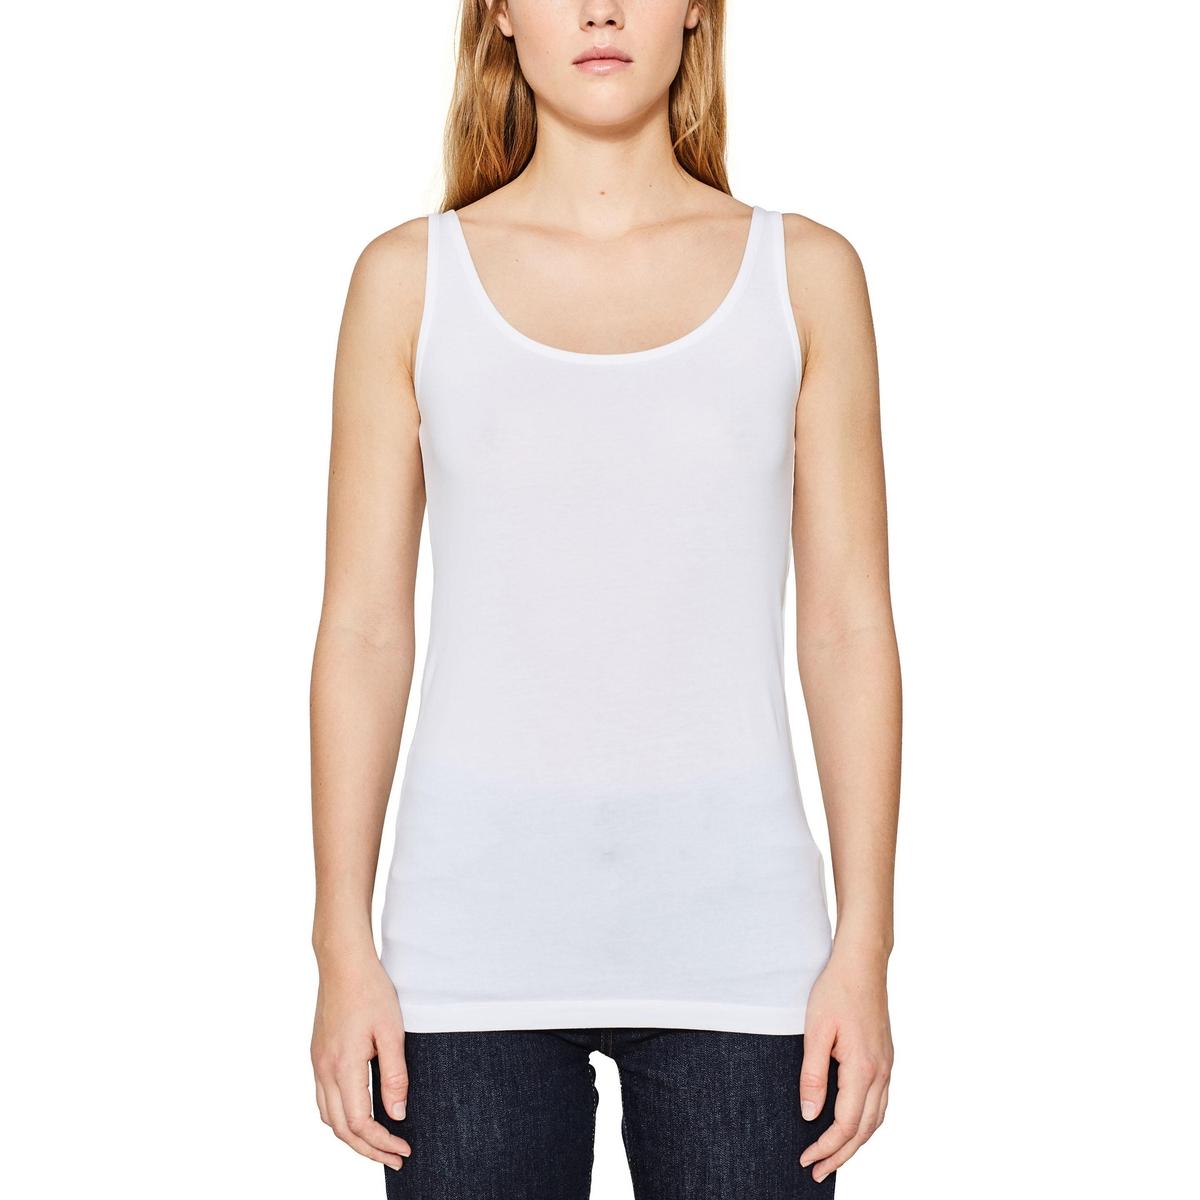 Camiseta lisa sin mangas de cuello redondo